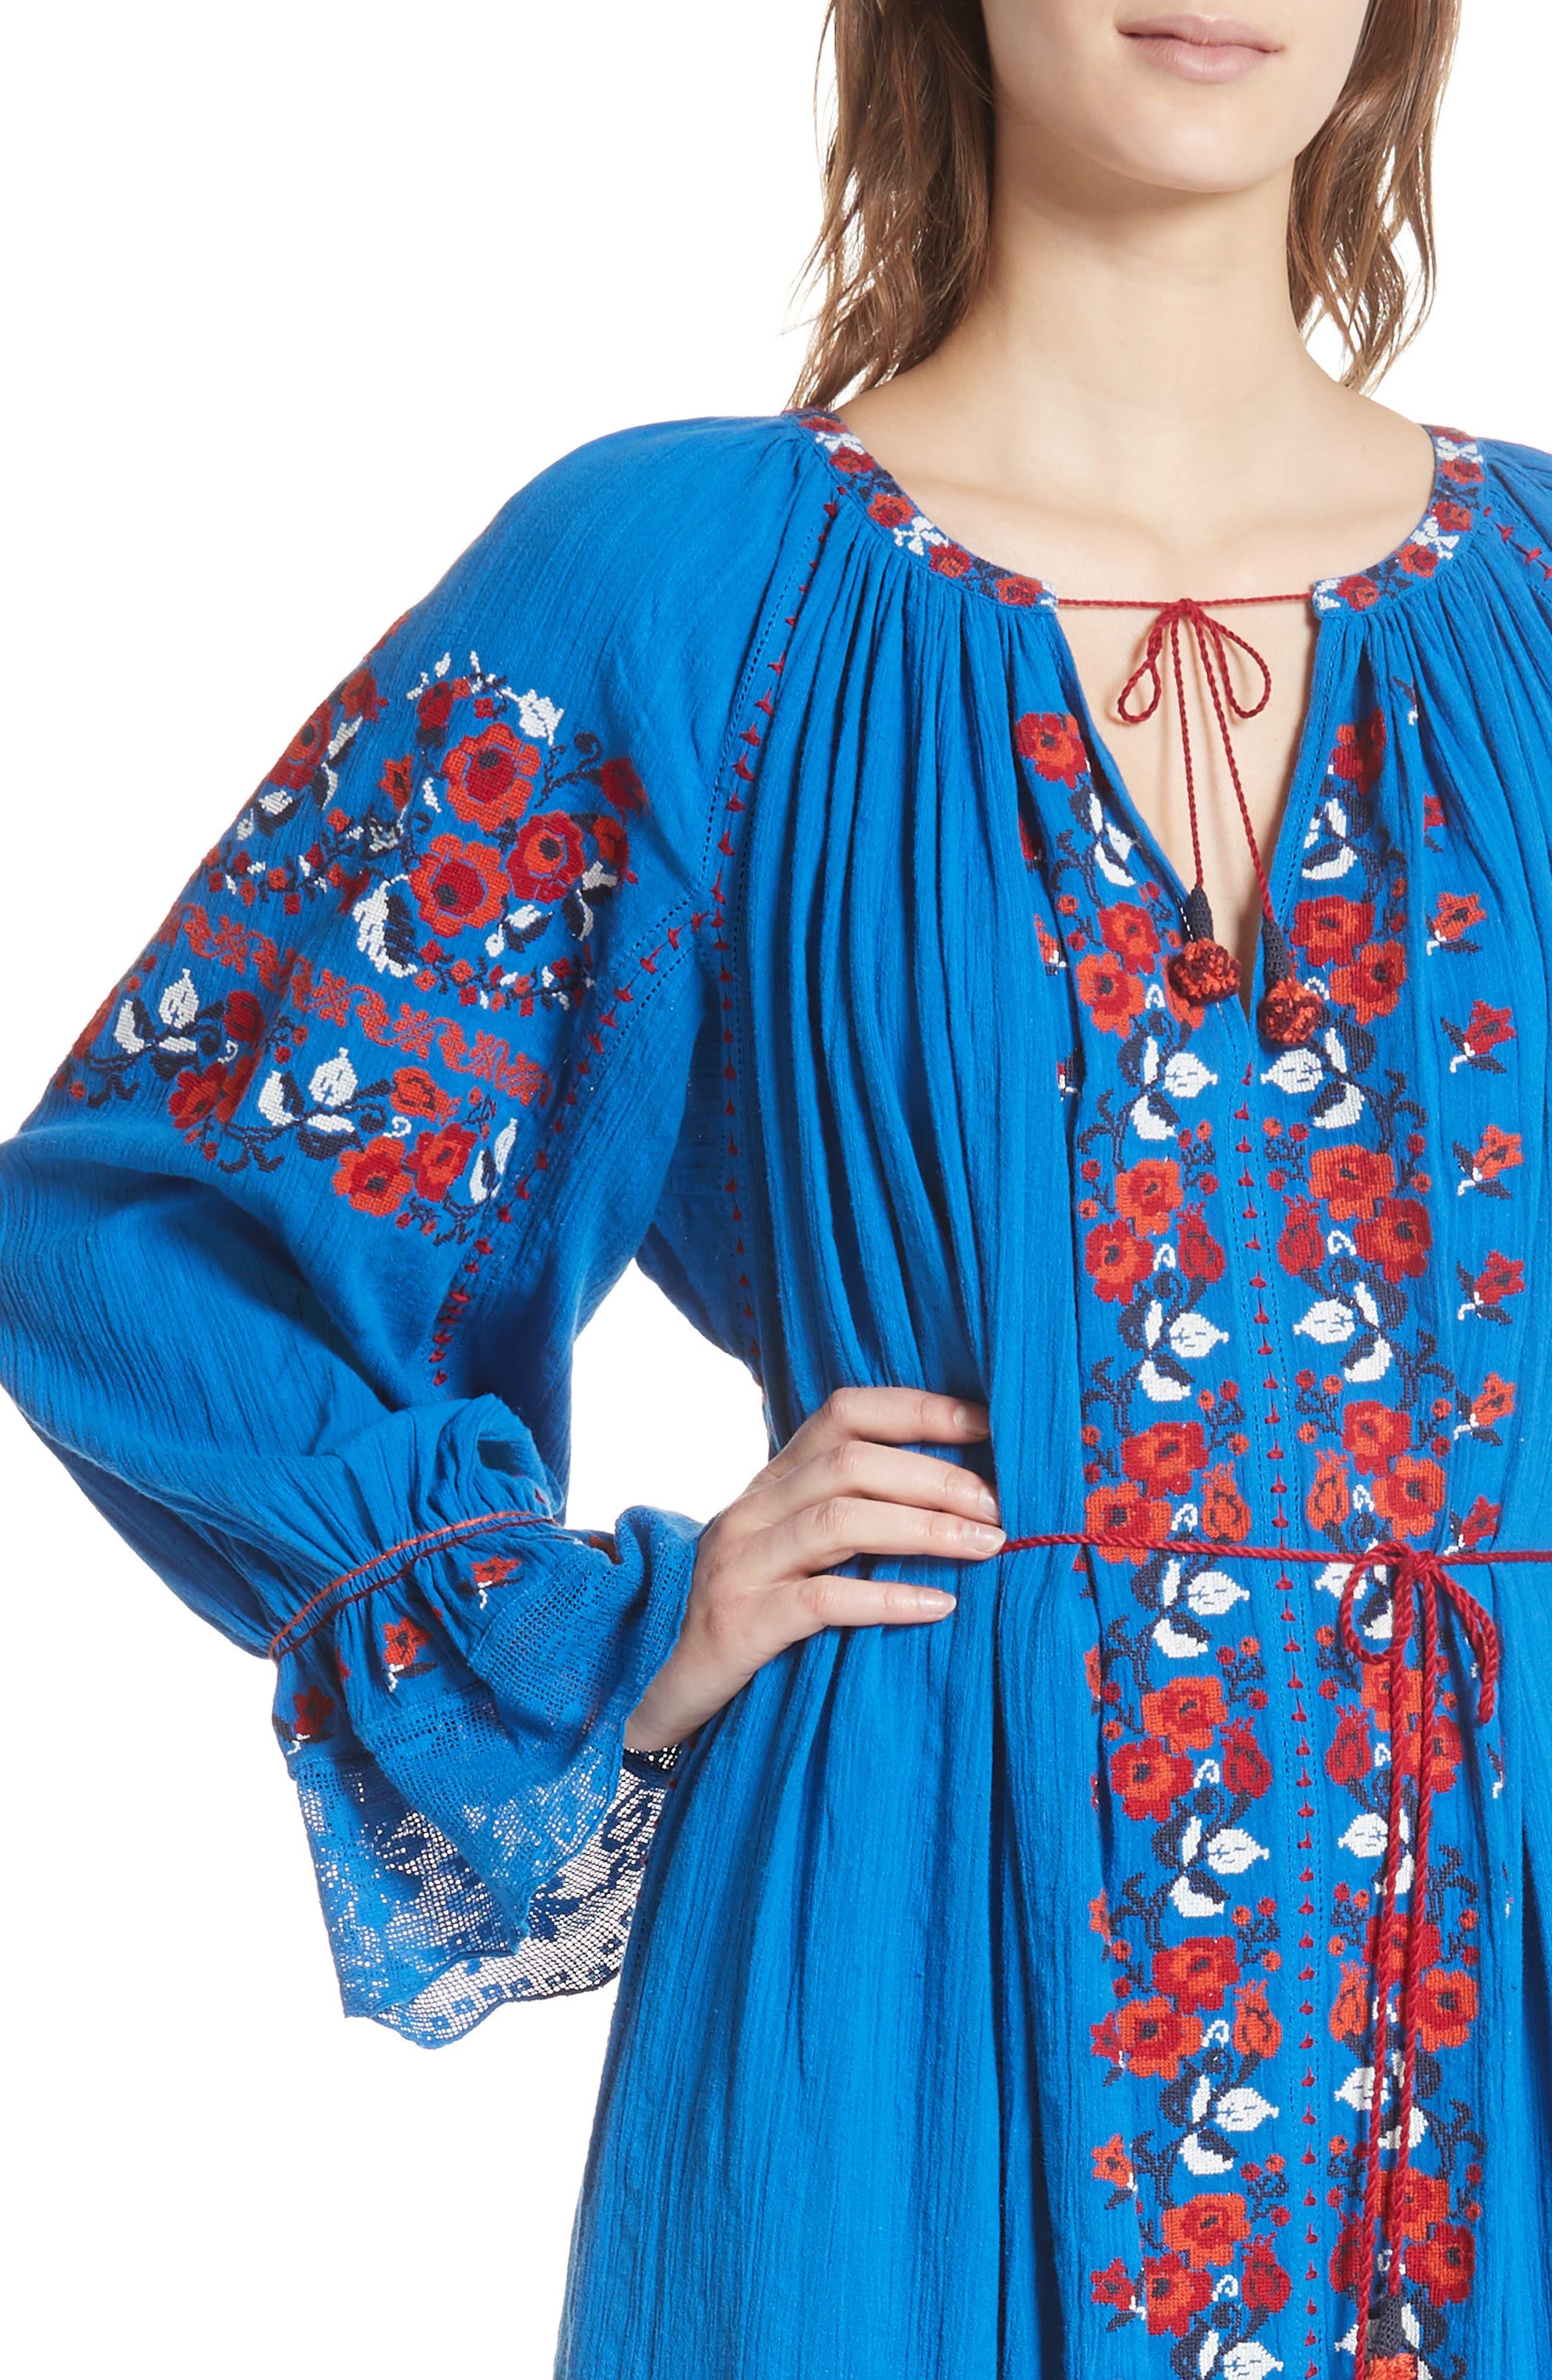 Filia Embroidered Midi Dress,                             Alternate thumbnail 4, color,                             400